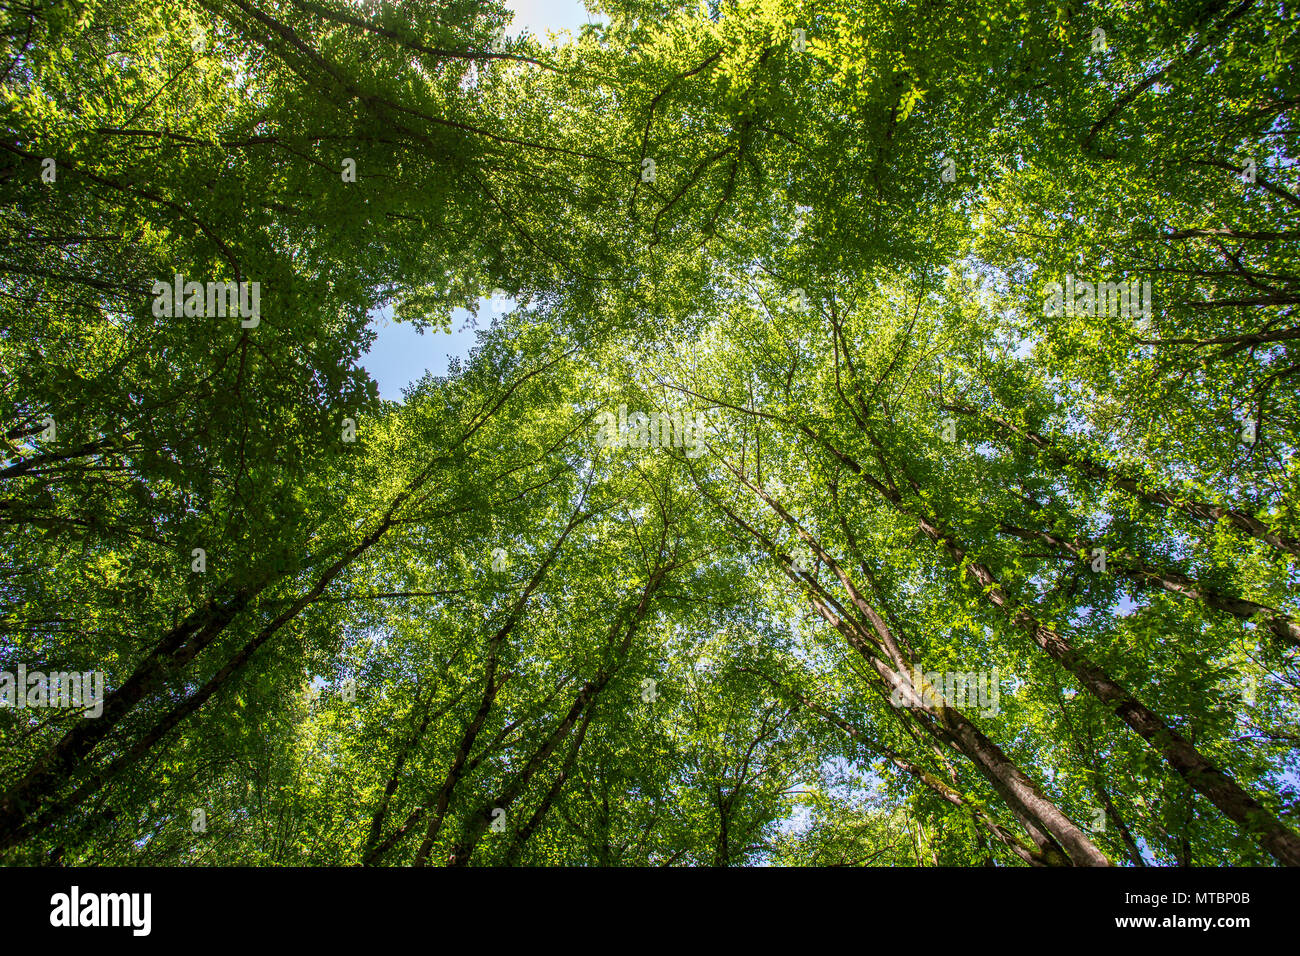 Azerbaijan Nature. Beautiful places - Stock Image